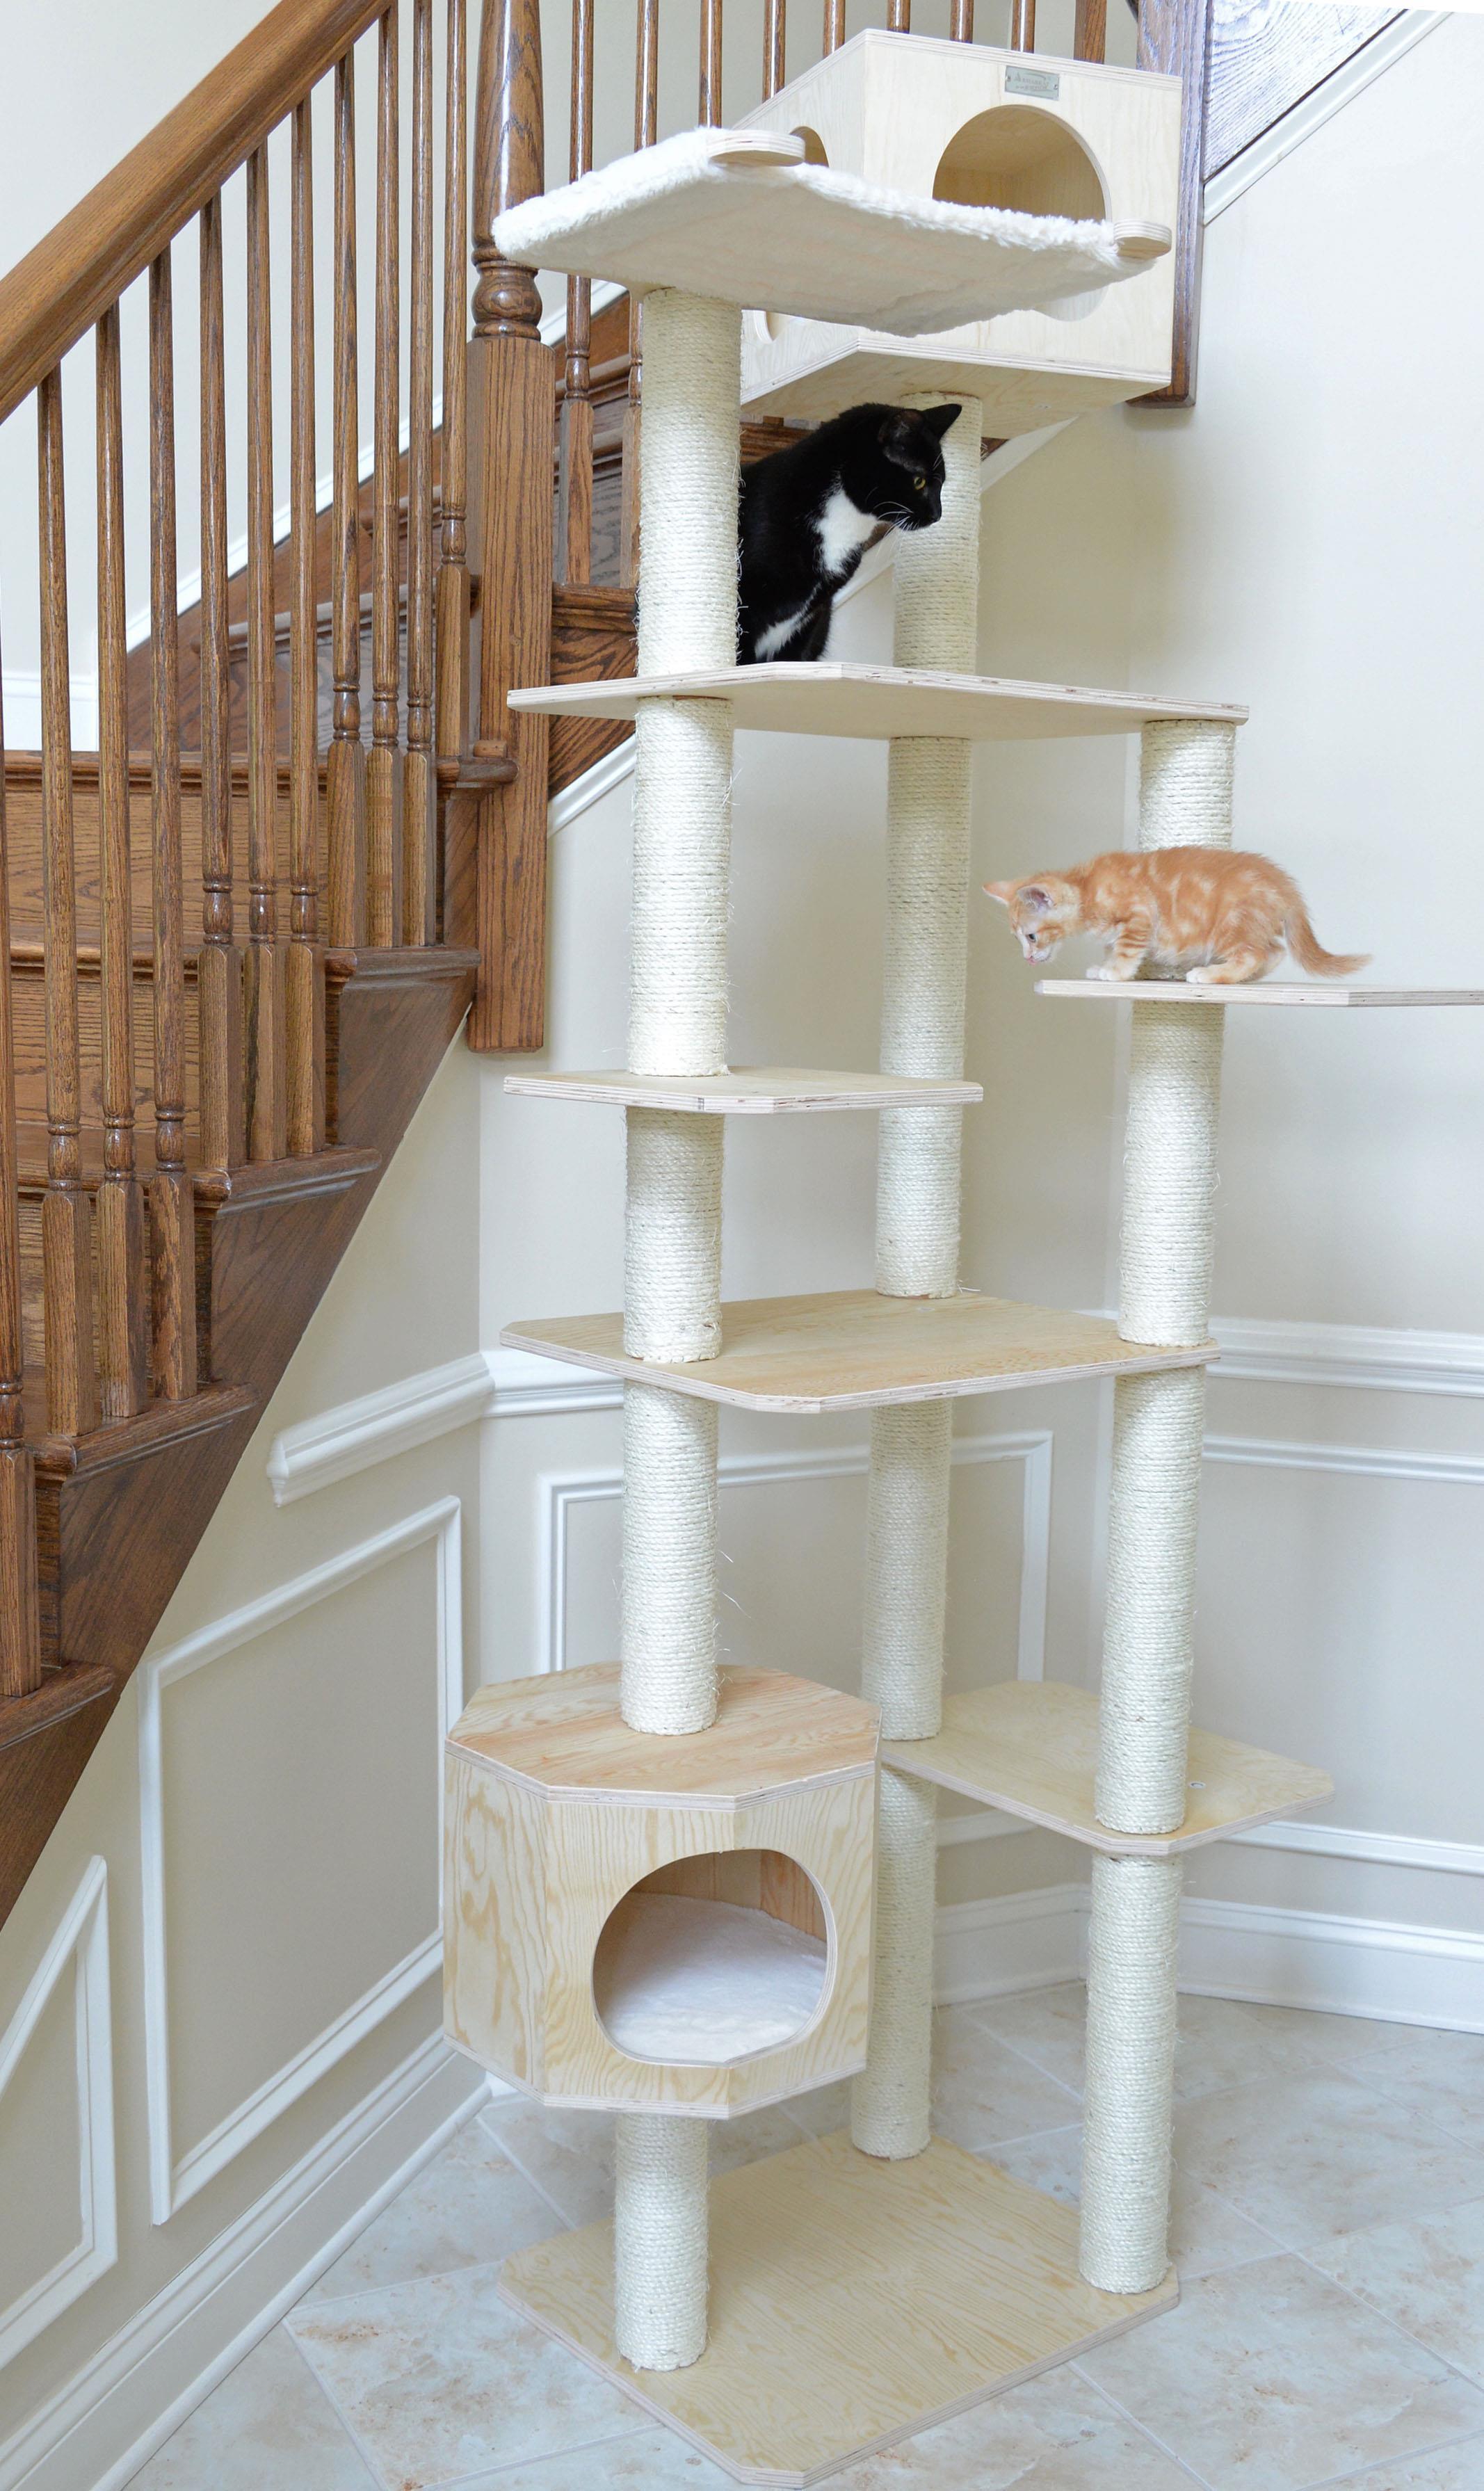 New Design Armarkat Solid Wood Cat Tree Condo Furniture   [S8902]